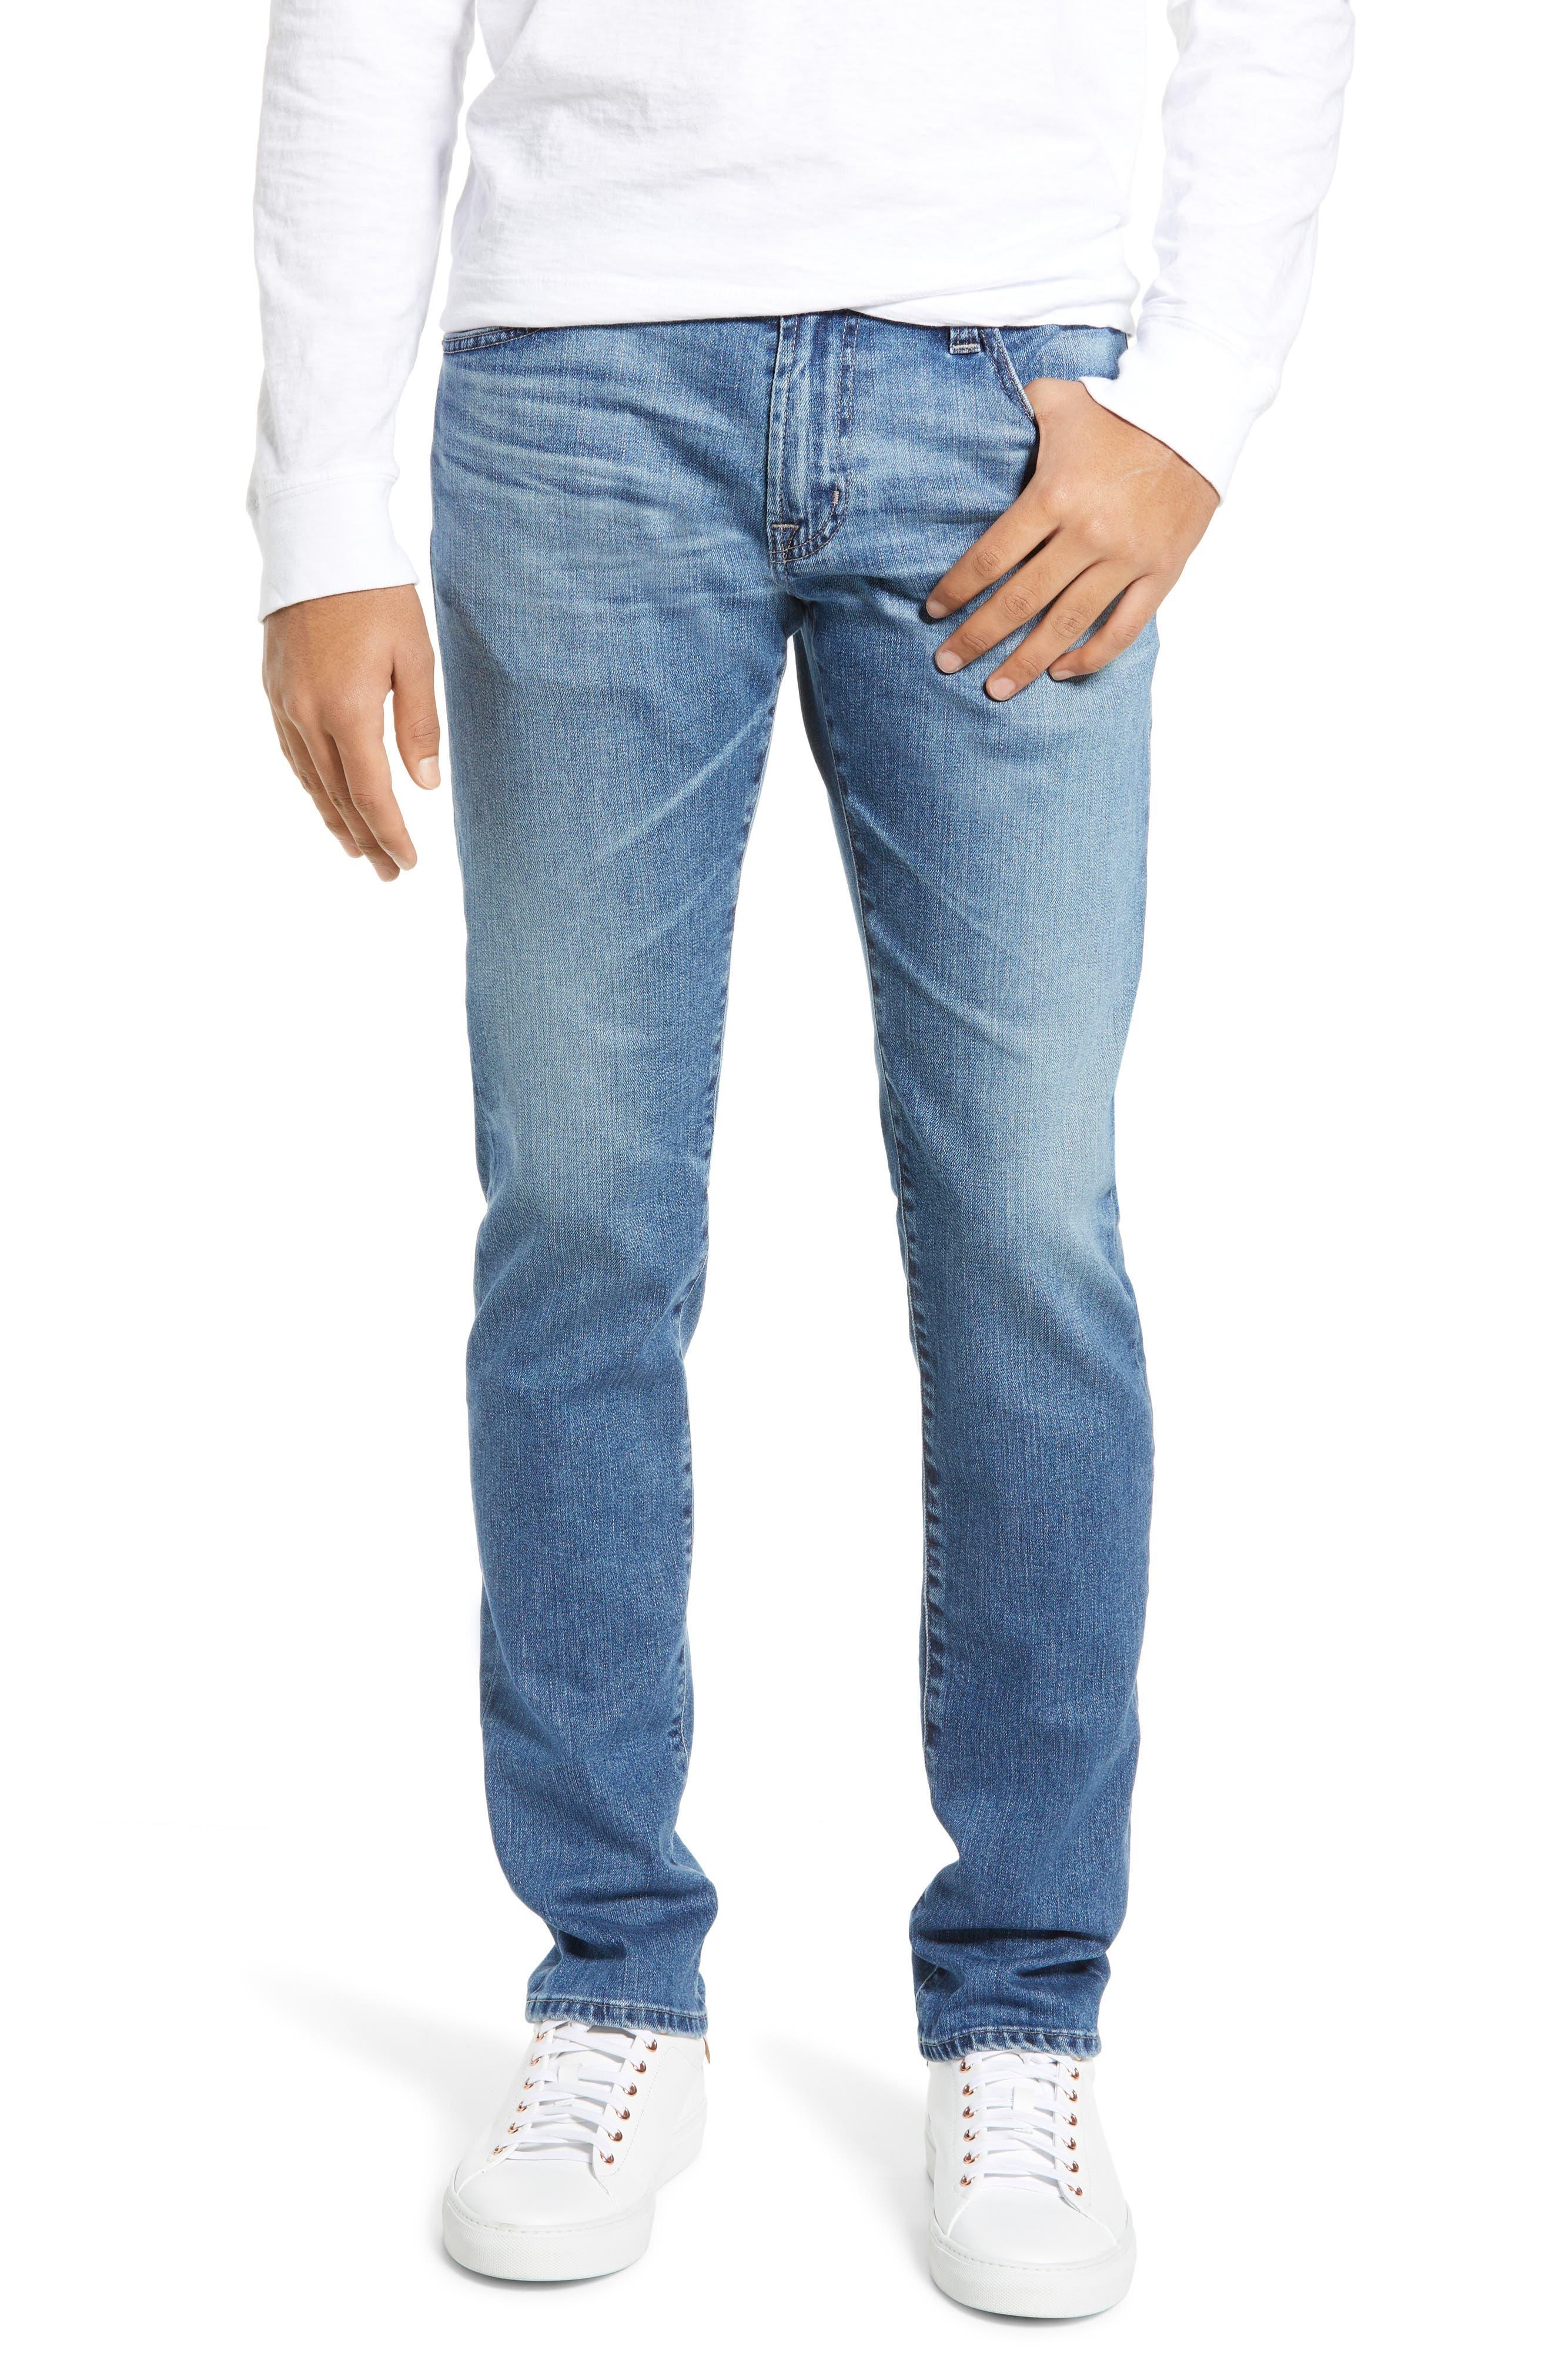 Tellis Slim Fit Jeans,                             Main thumbnail 1, color,                             16 YEARS EAVES